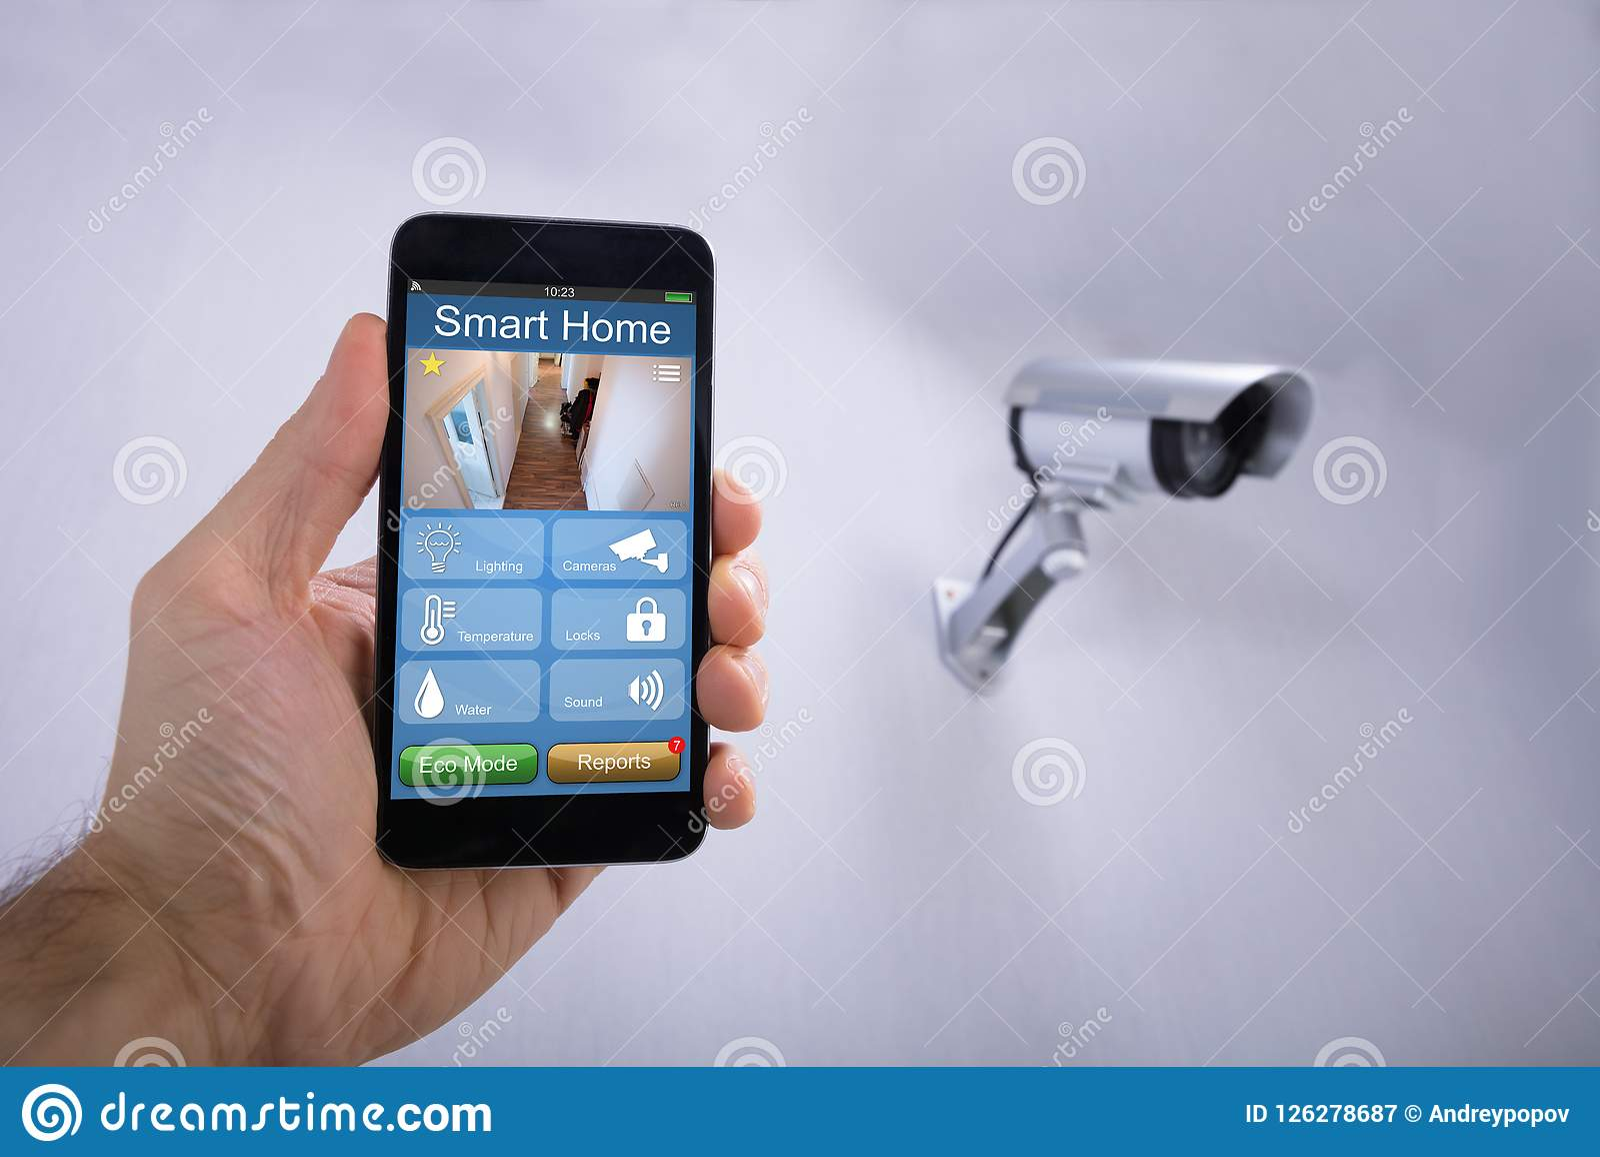 Human Hand Using Smart Home Application On Smartphone